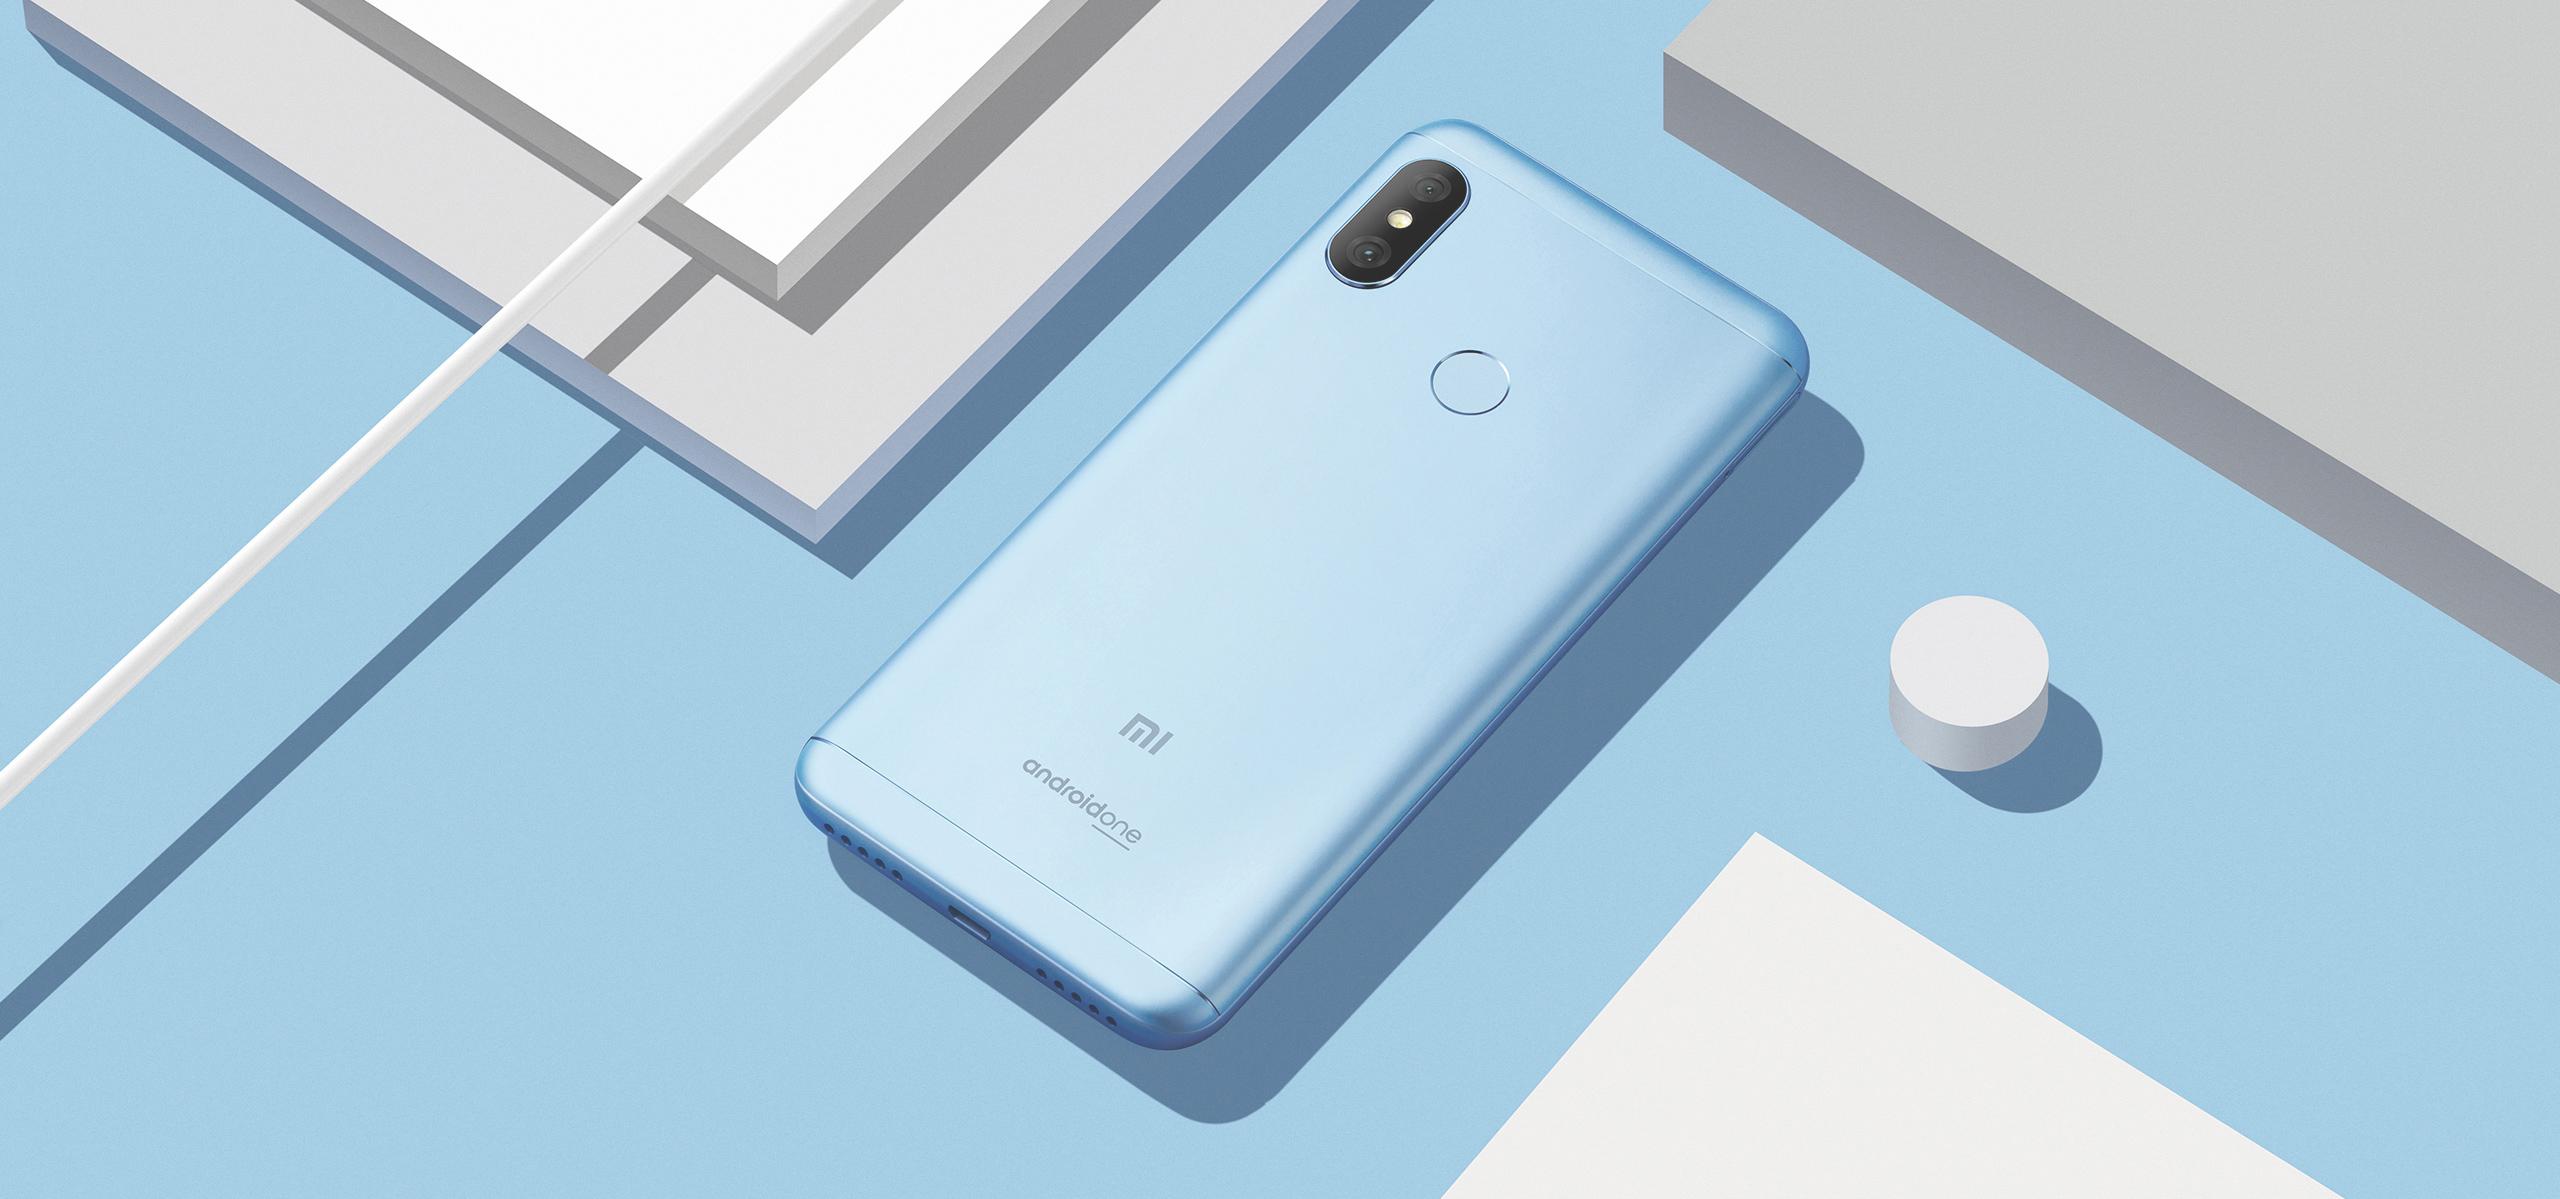 Smartphone Mi A2 Lite - 4+64GB -  Albastră